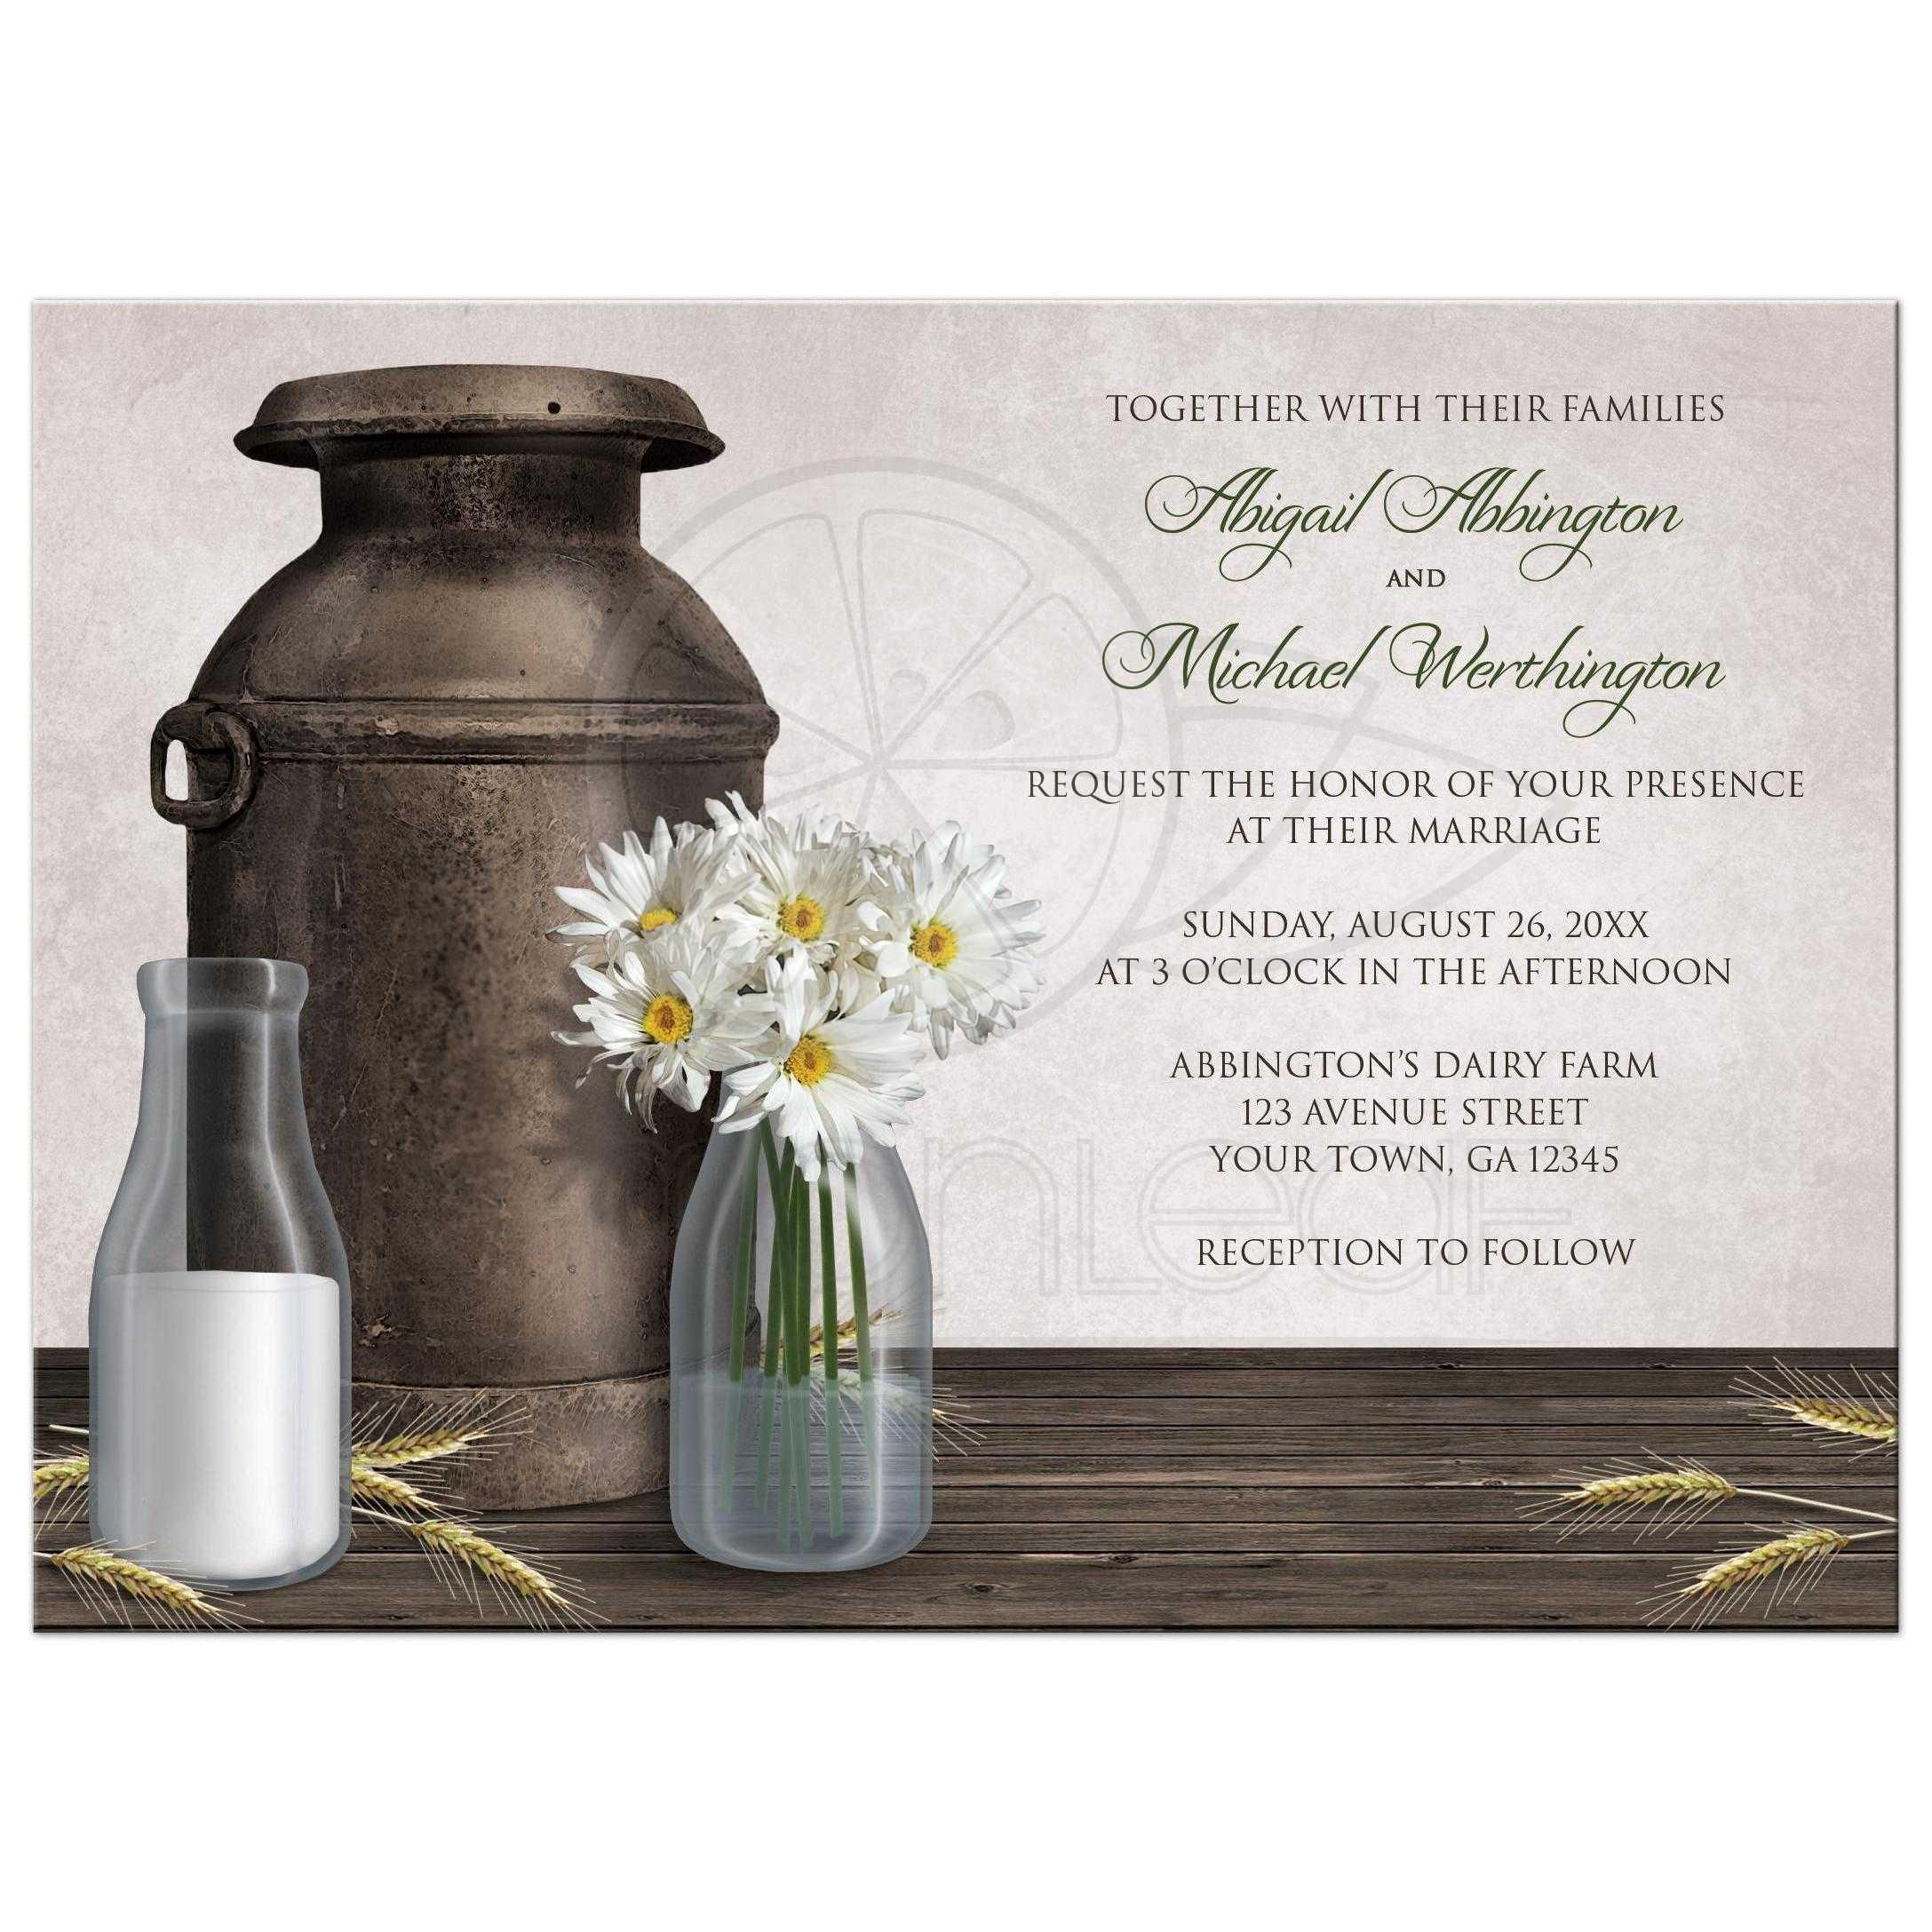 Wedding Invitations Rustic Country Dairy Farm